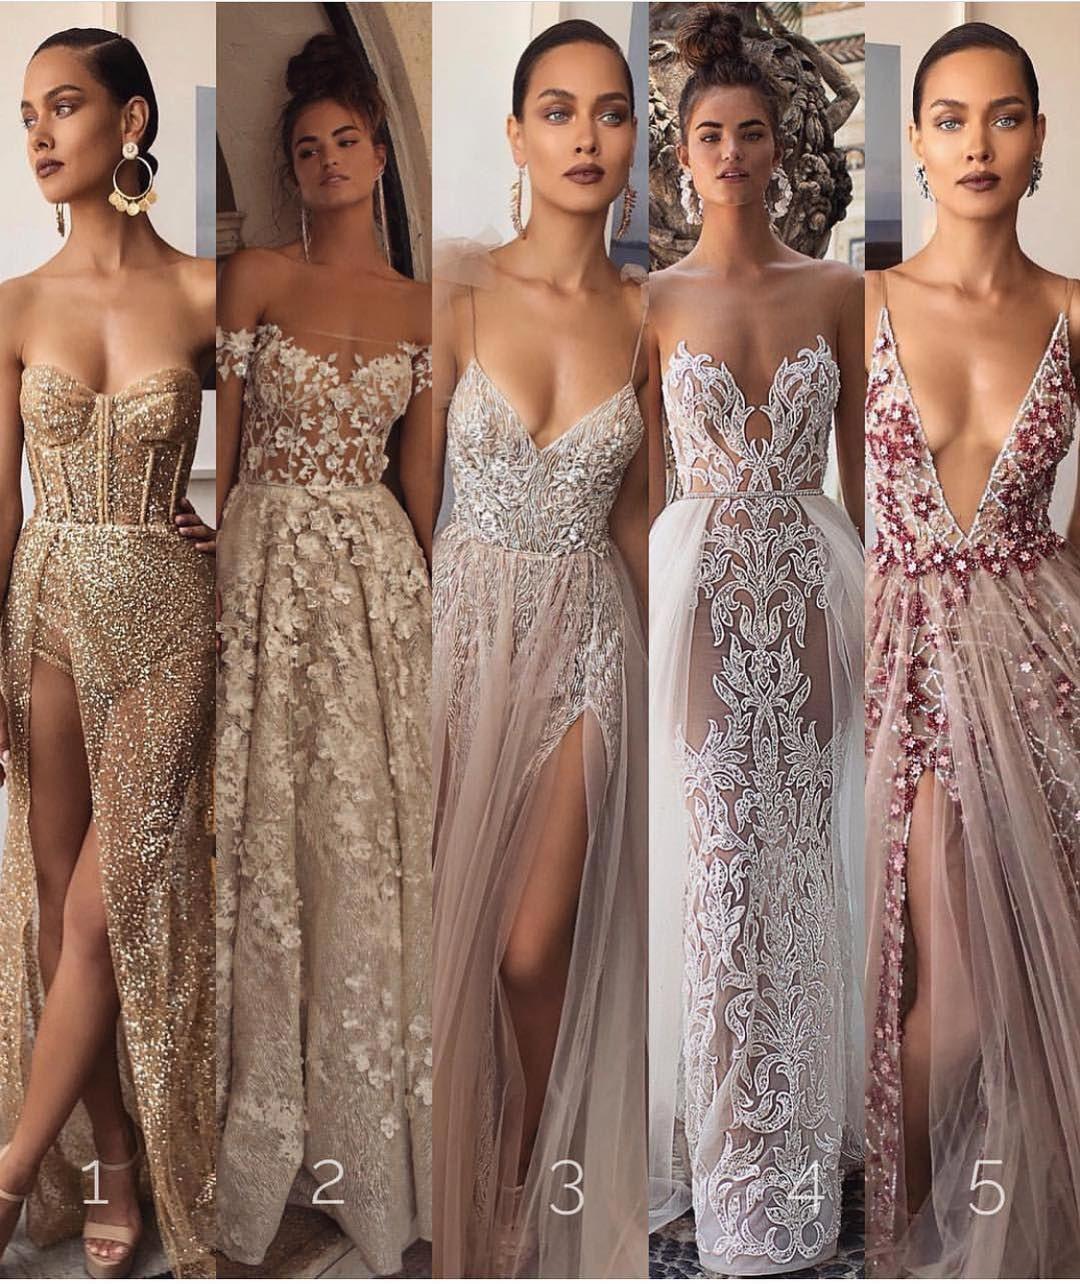 Formal Elegant Extravagante Abendkleider VertriebAbend Einzigartig Extravagante Abendkleider Vertrieb